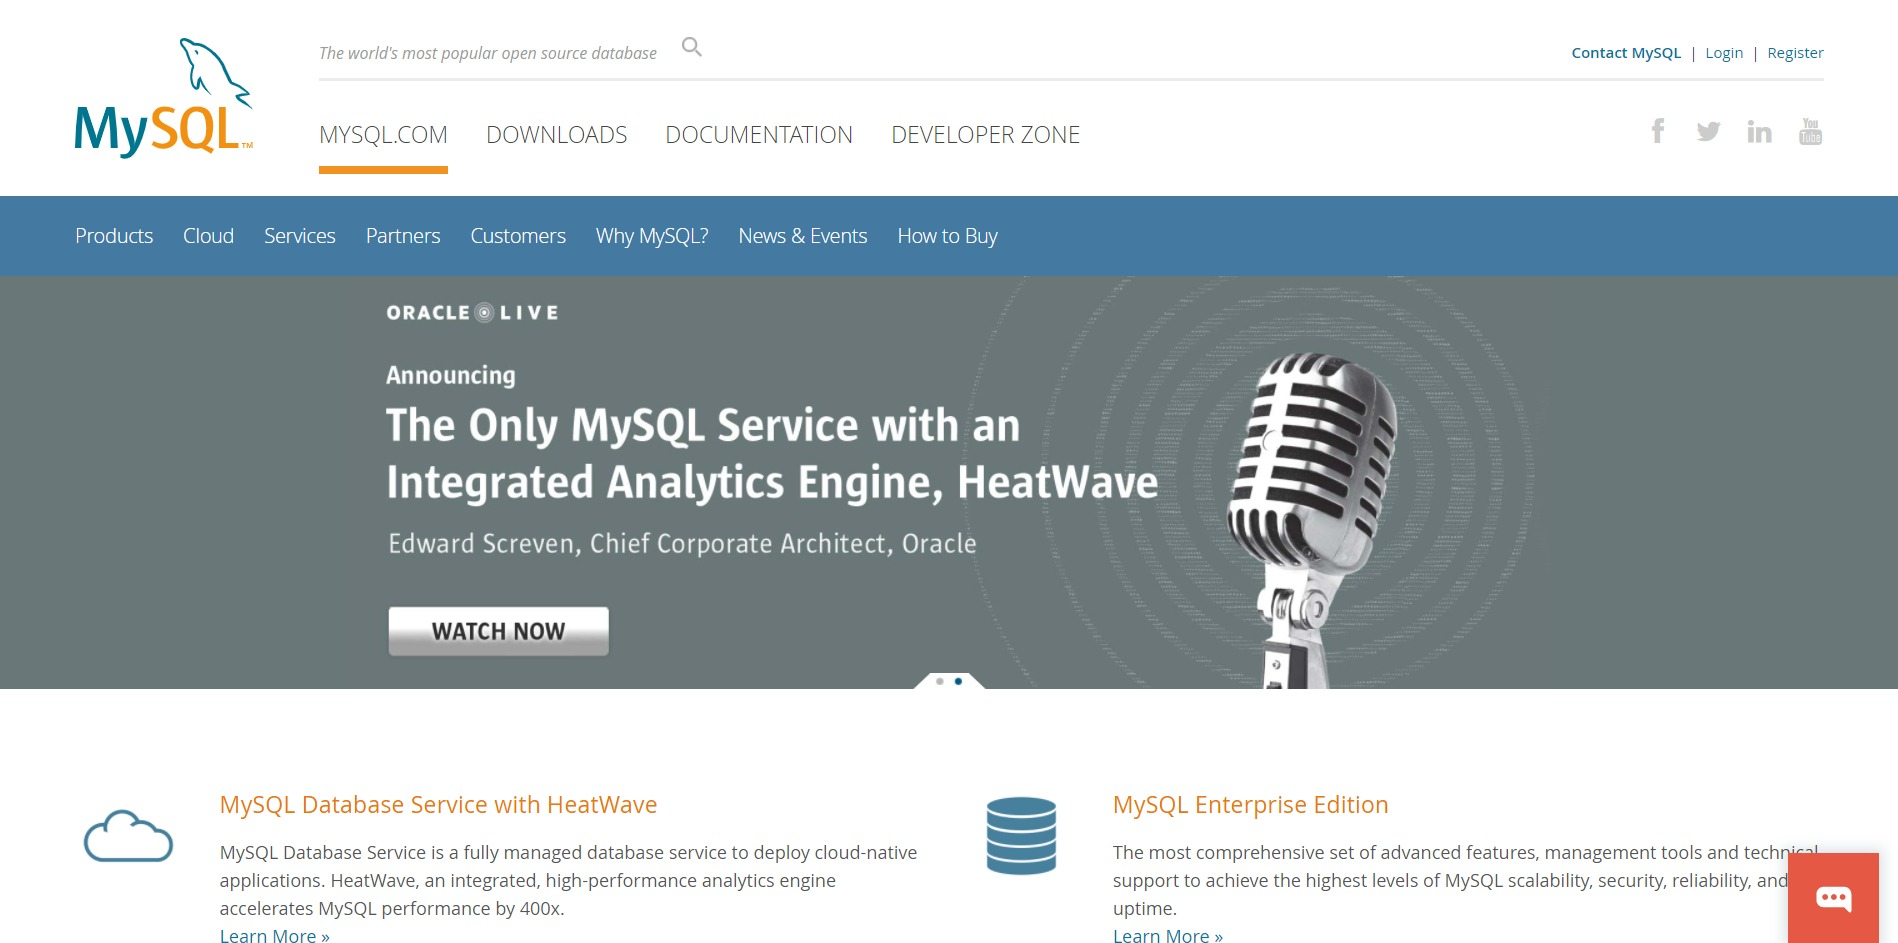 MySQL Main Page